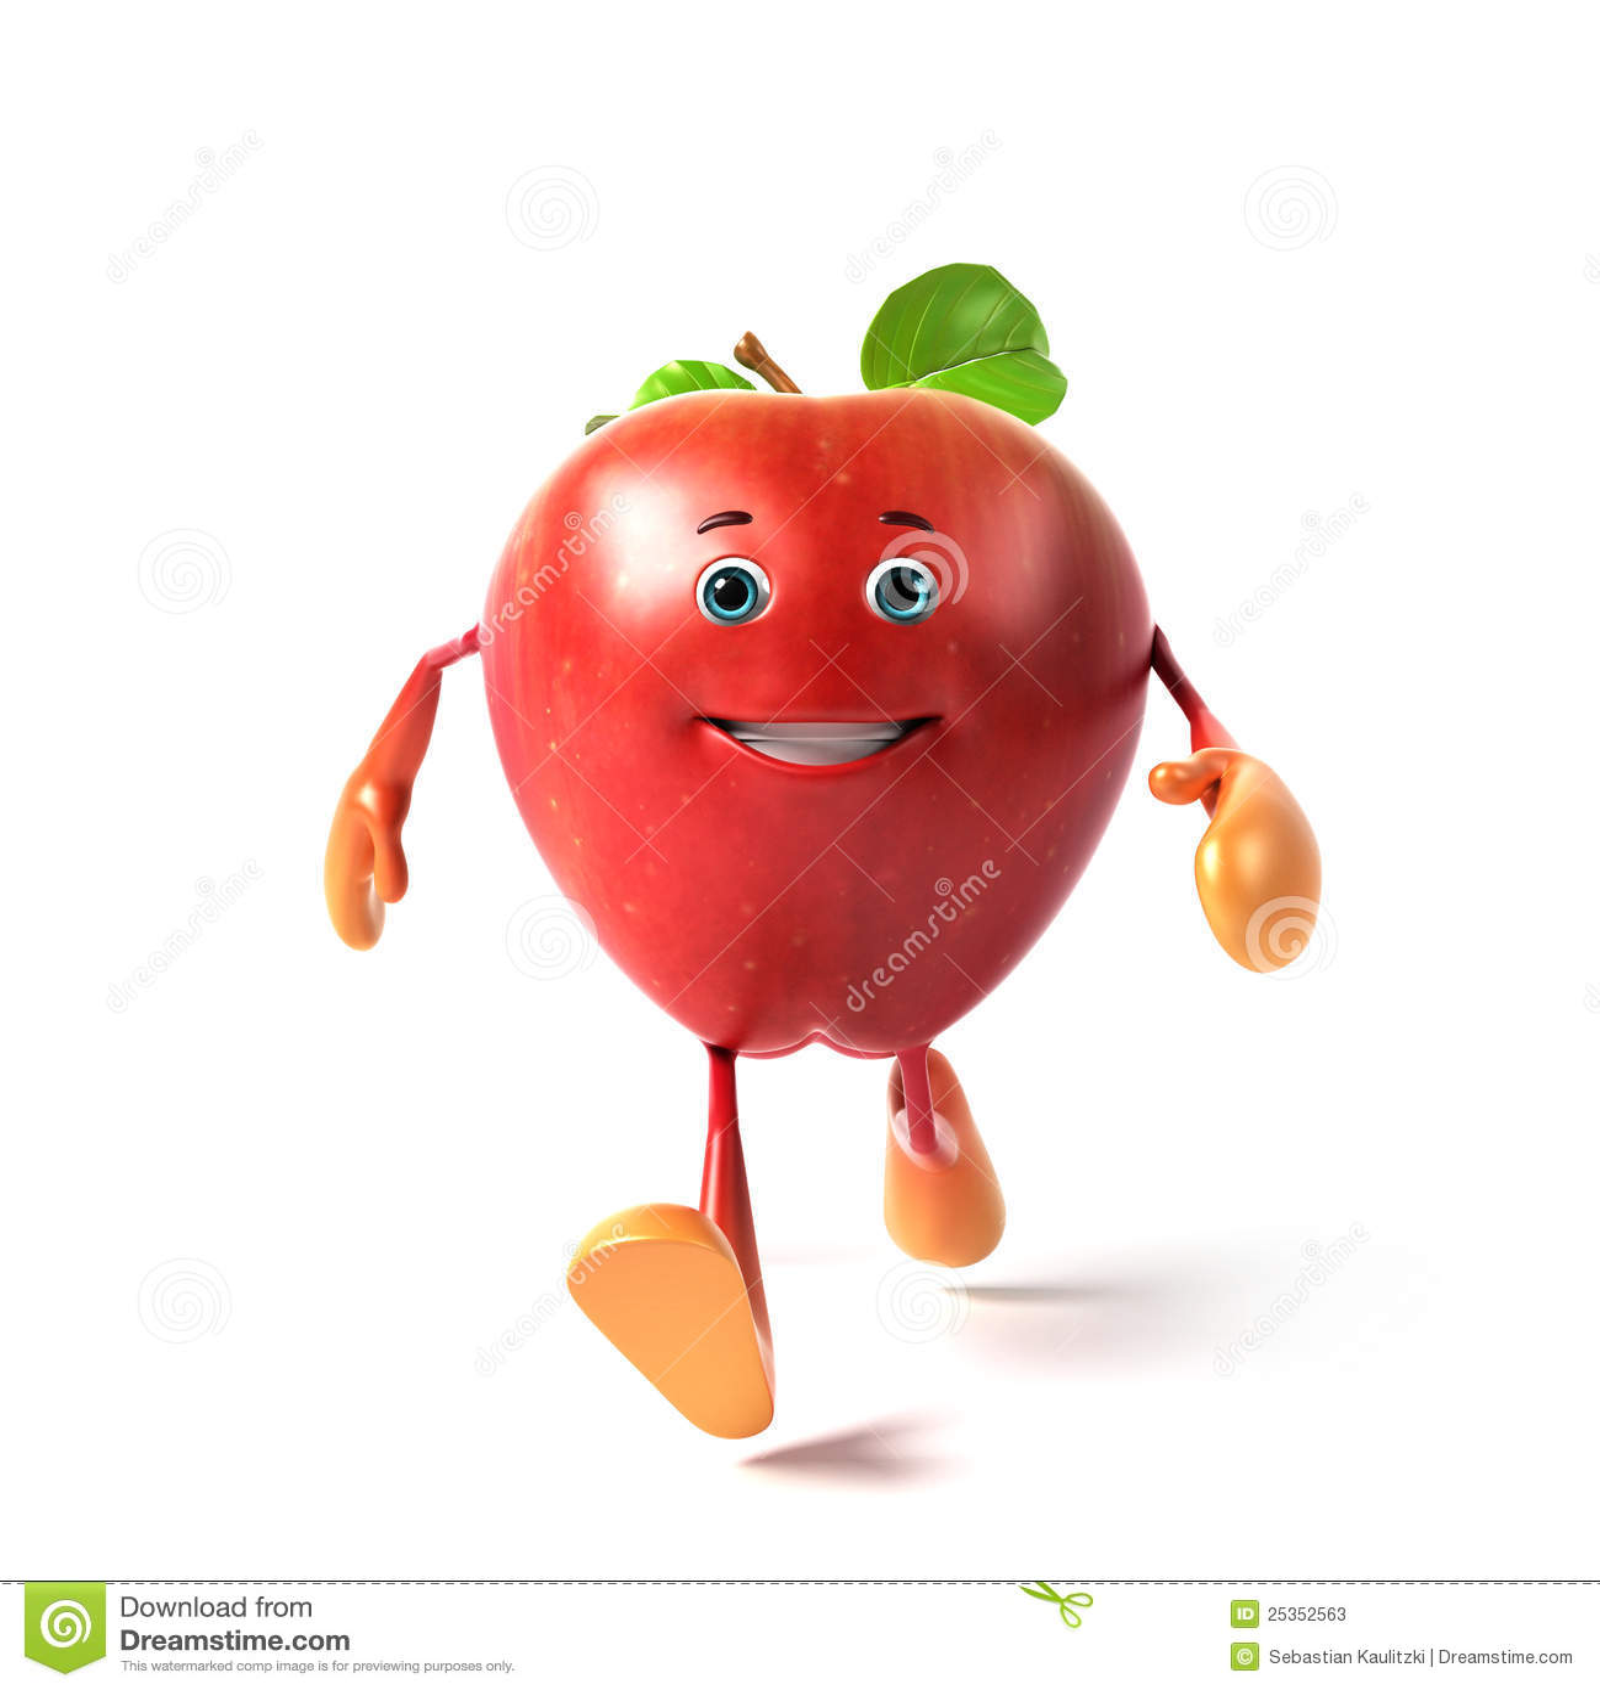 Funny Apple Stock Photos - Image: 25352563